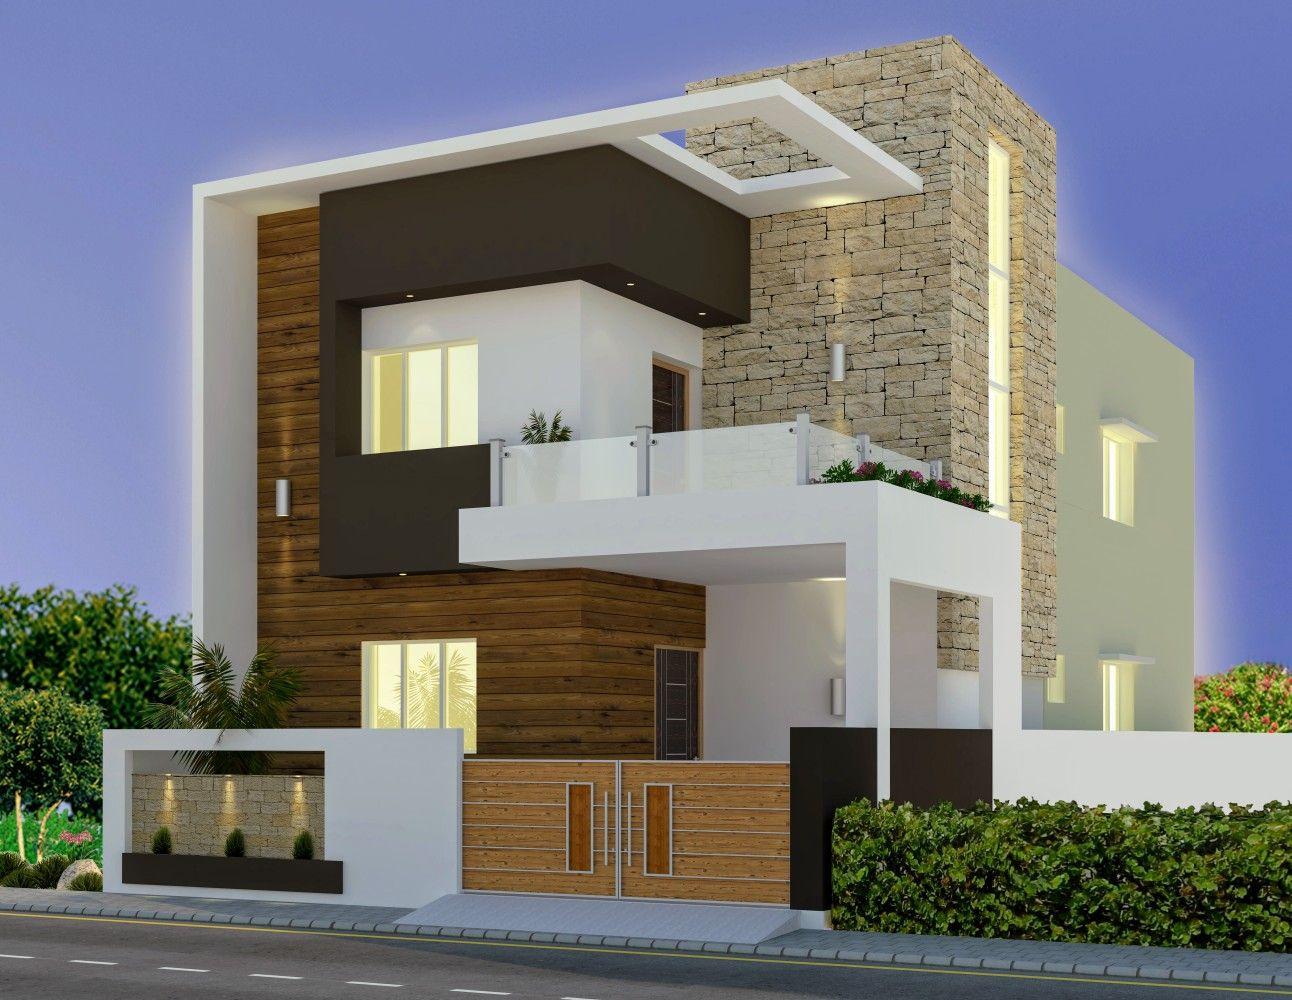 Elevacion house front design modern house design dream home design building elevation